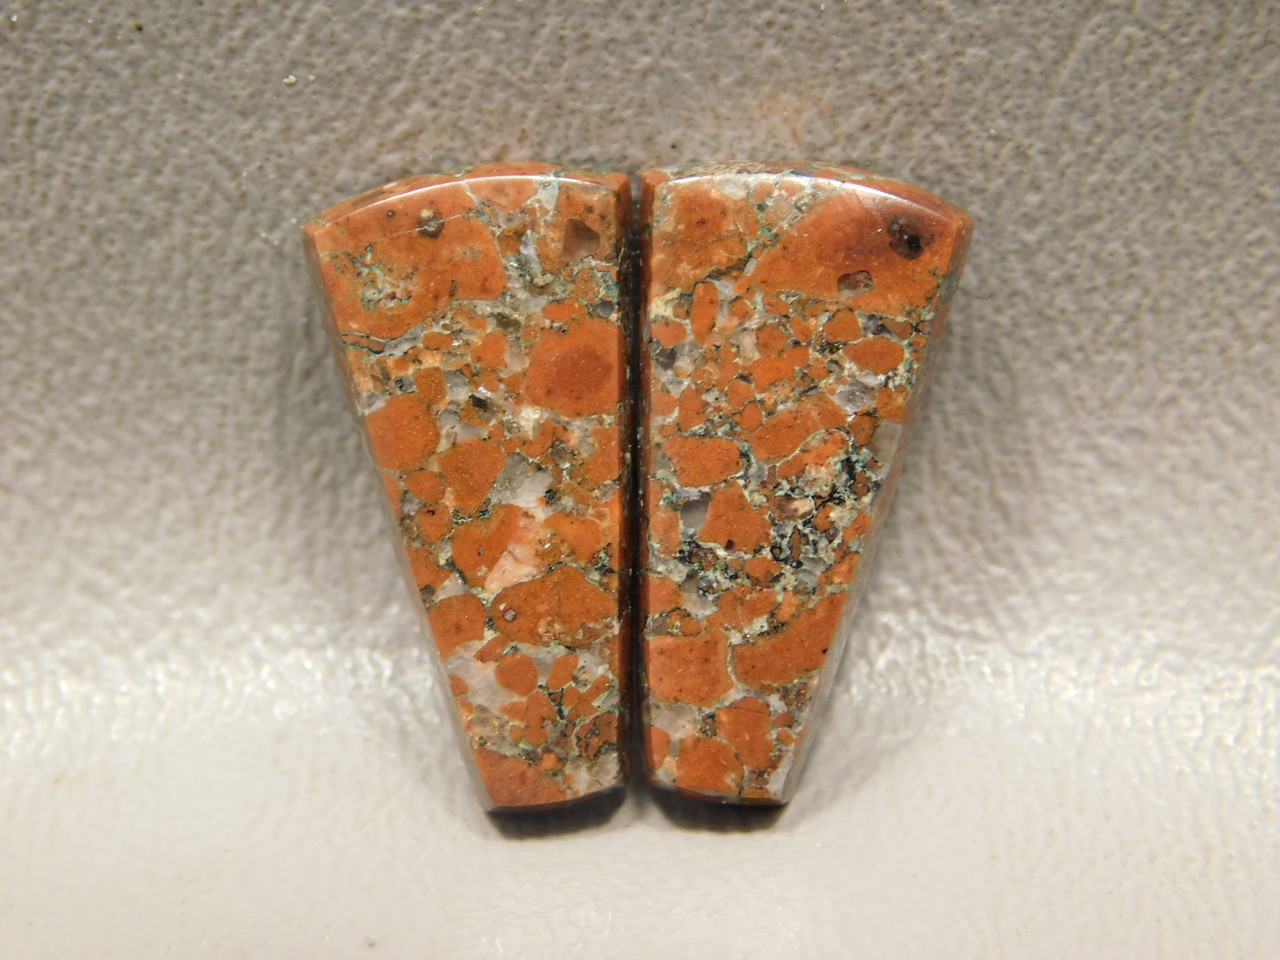 Copper Rose Semi Precious Gemstone Matched Pair Cabochons #3